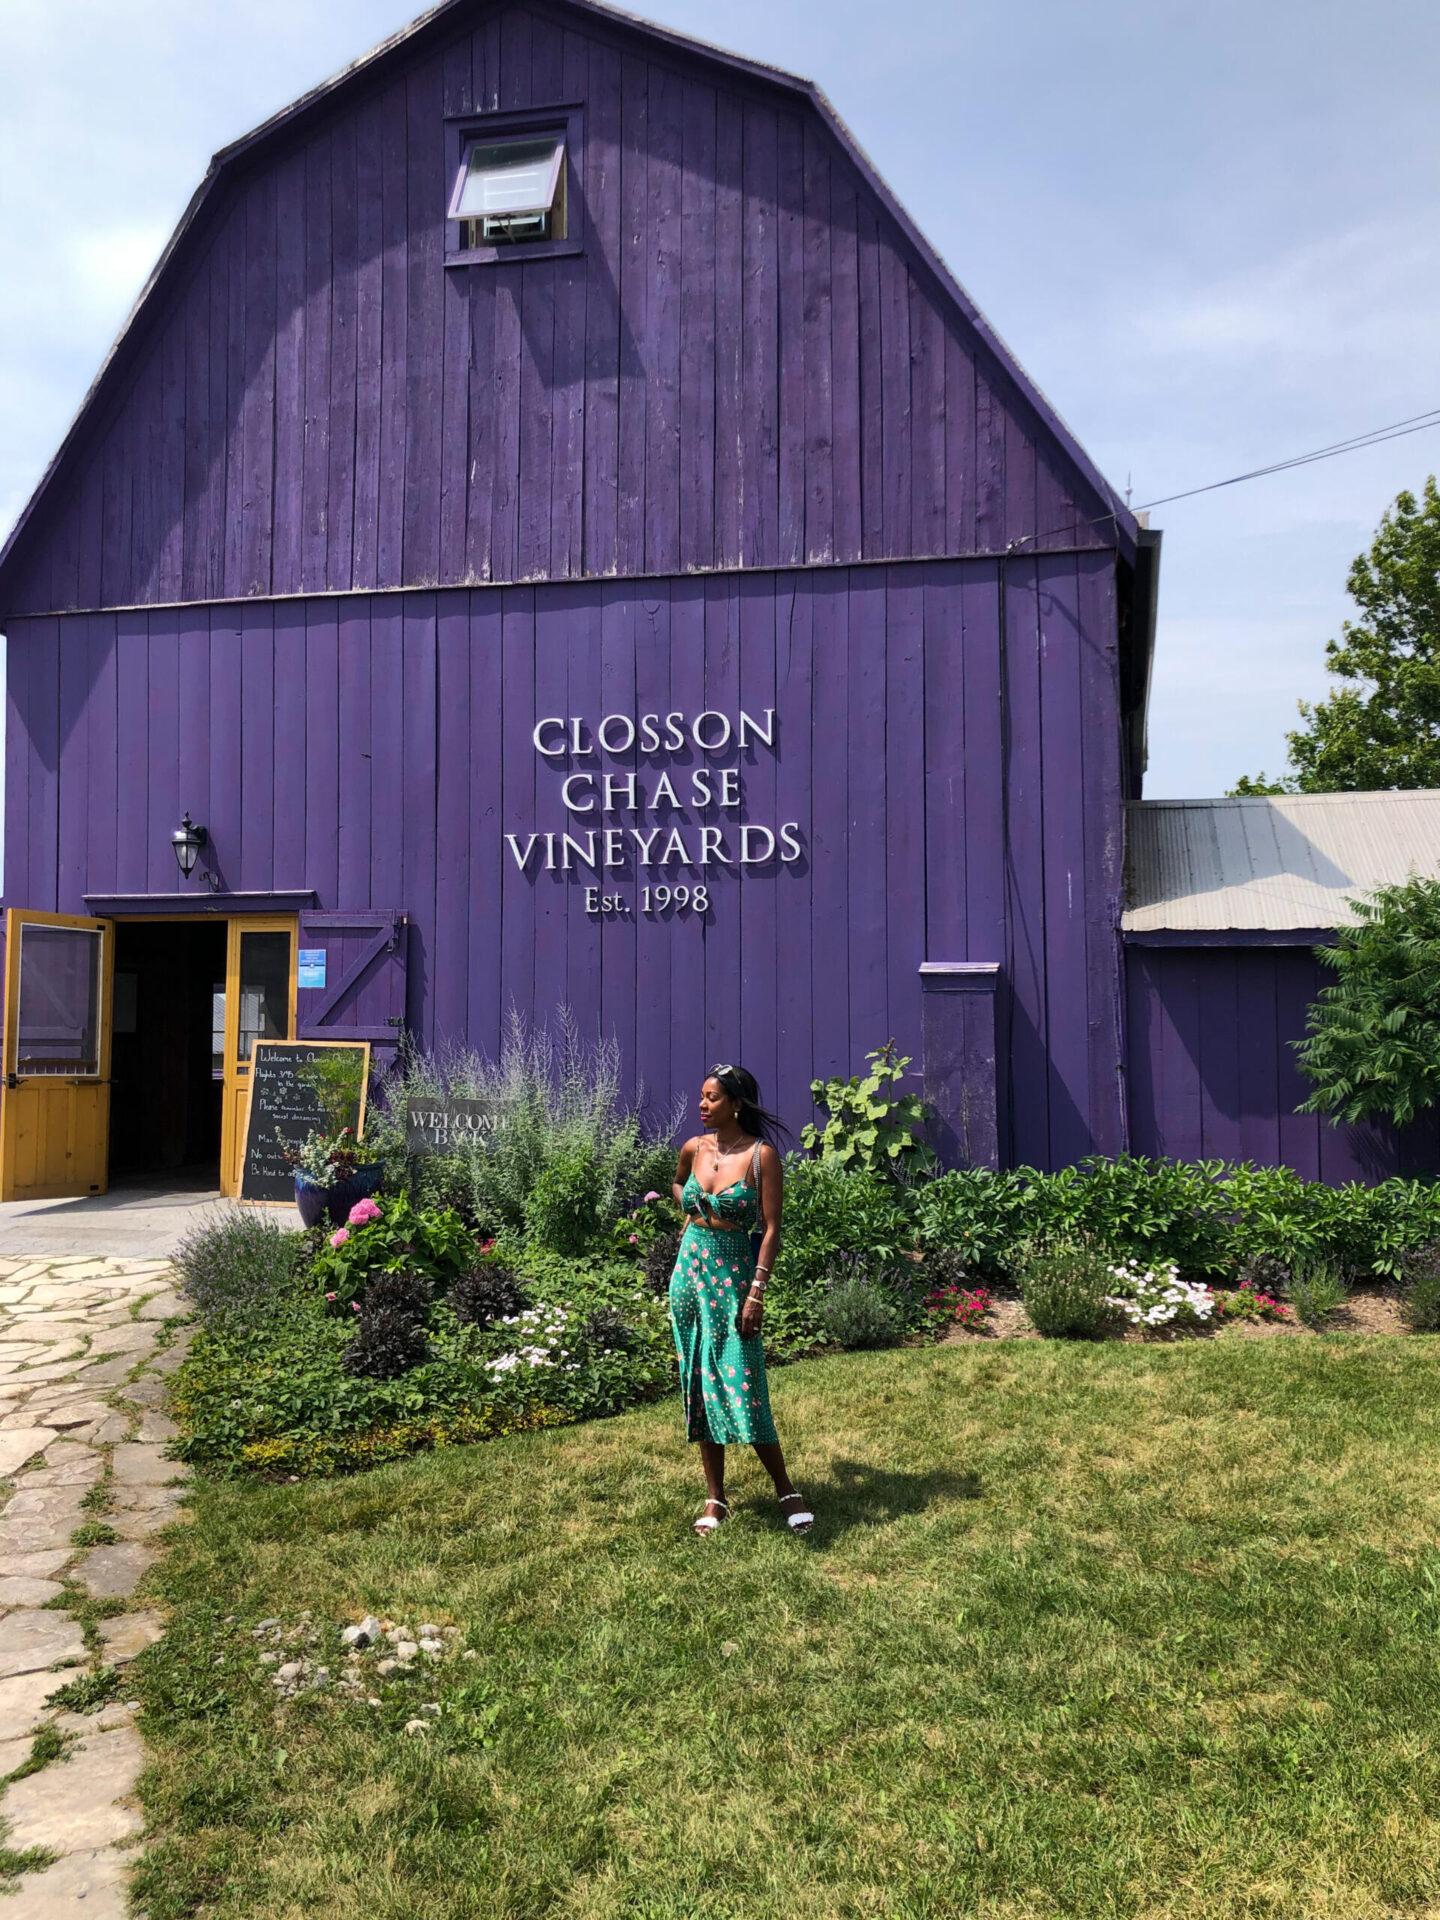 Closson Chase Vineyards